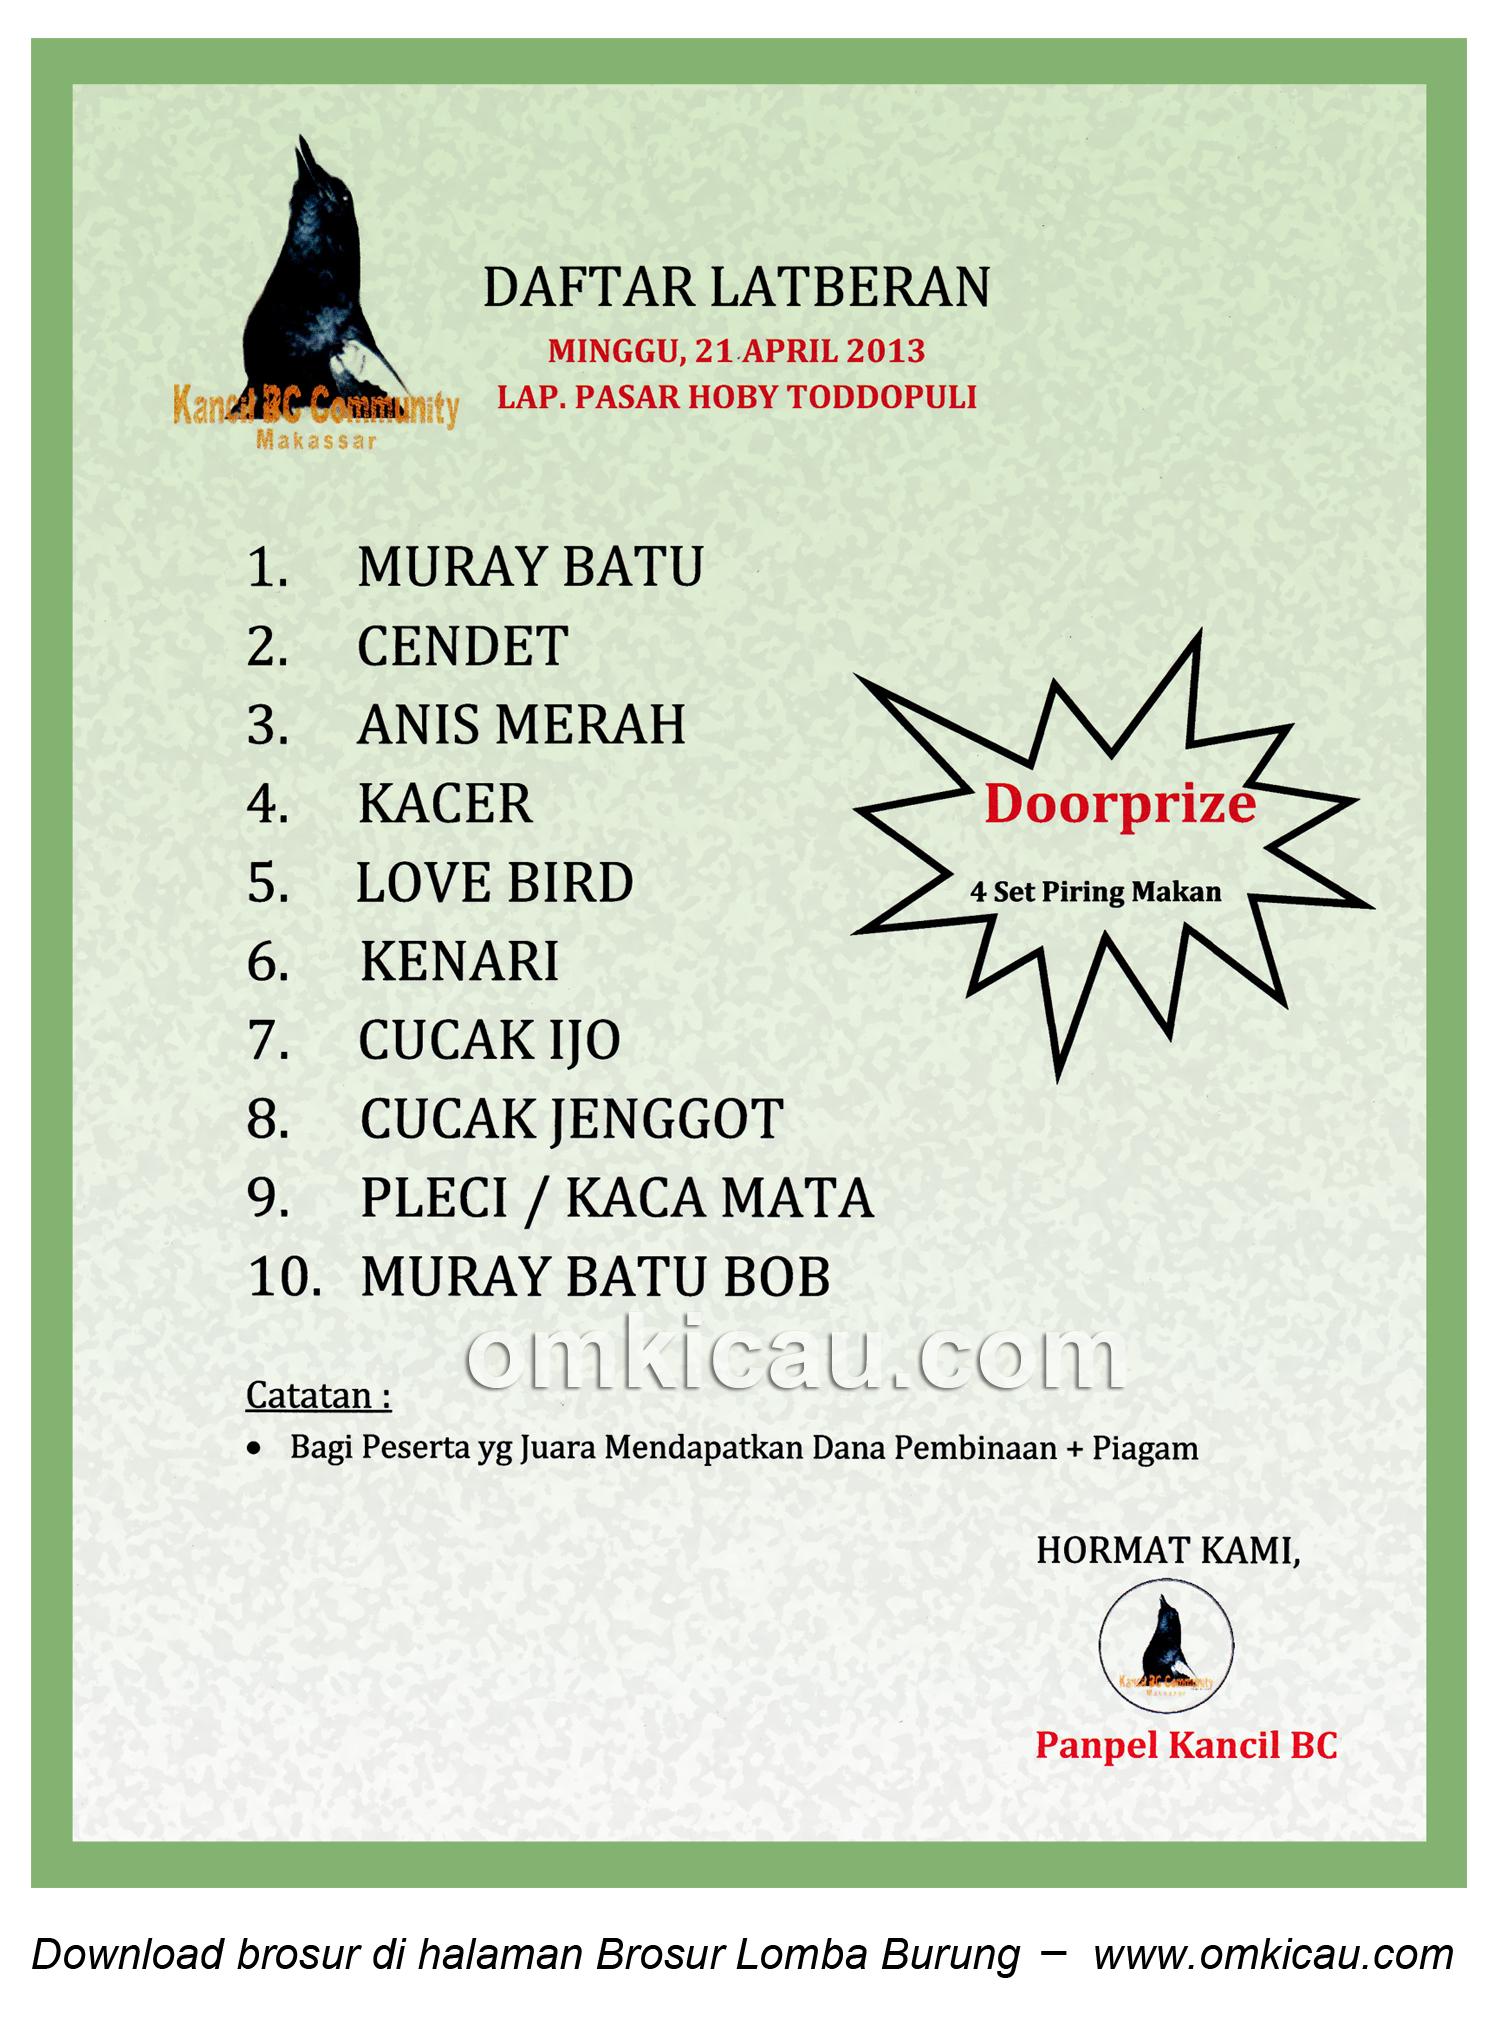 Brosur Latberan Kancil BC Makassar